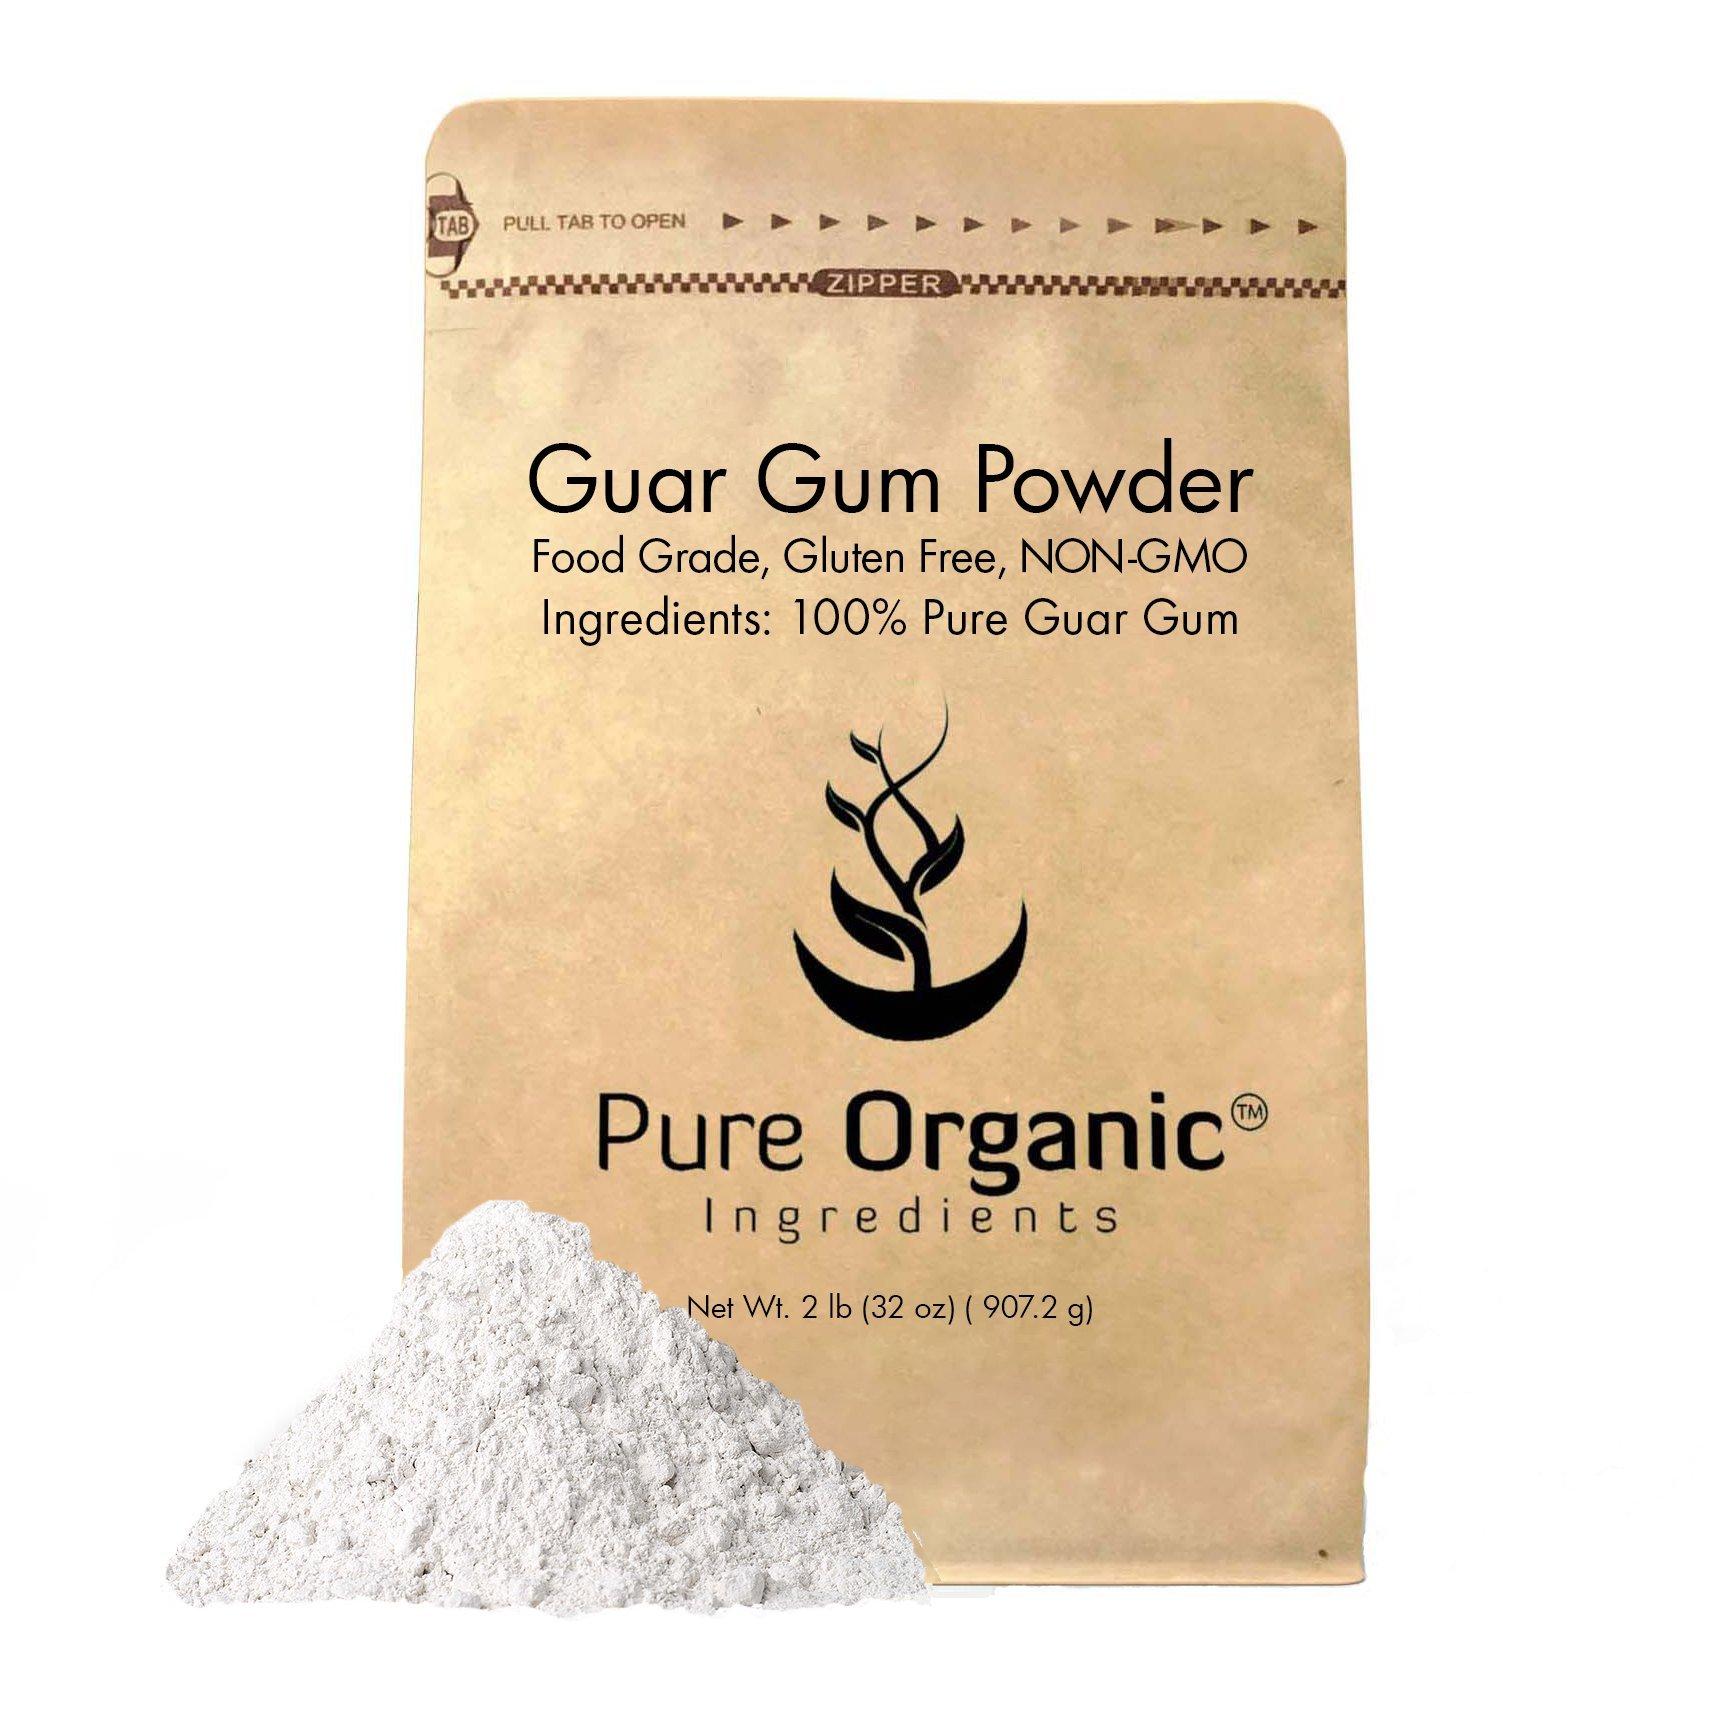 Pure Organic Ingredients Guar Gum Powder, 2 lb, 100% Food Grade, Gluten Free, Non-GMO,Thickening Agent